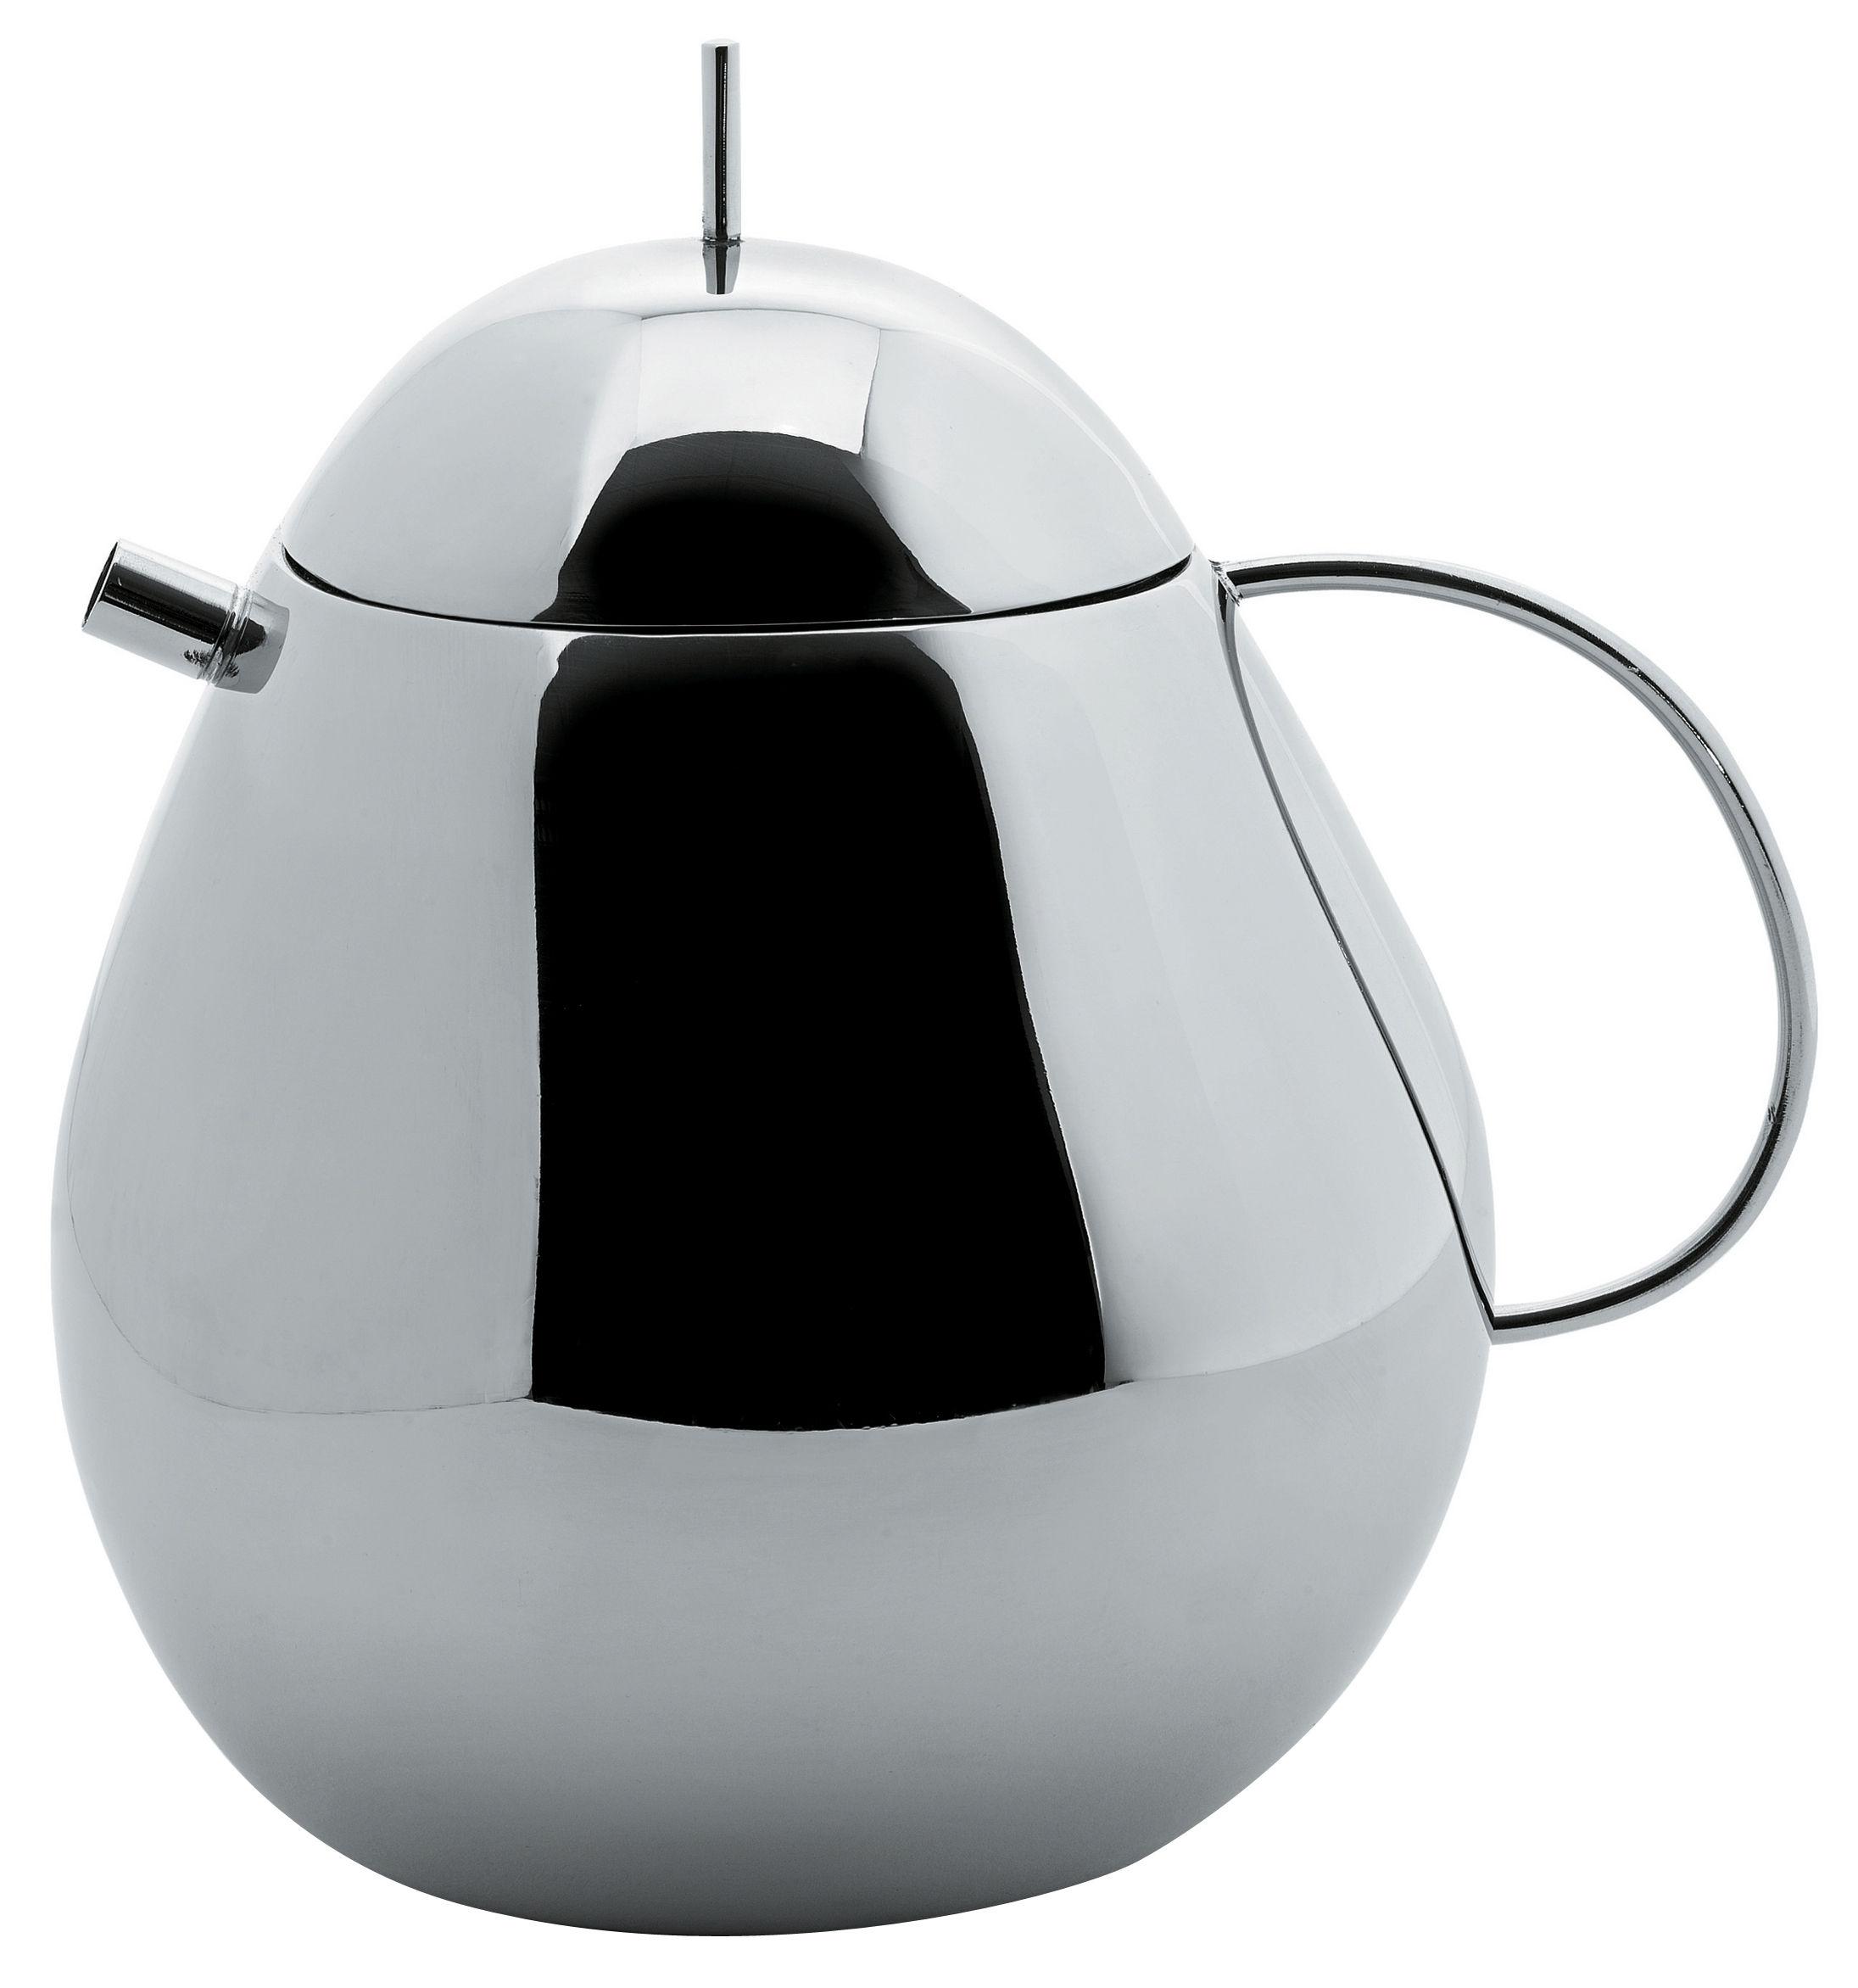 fruit basket teapot steel by alessi - zoom